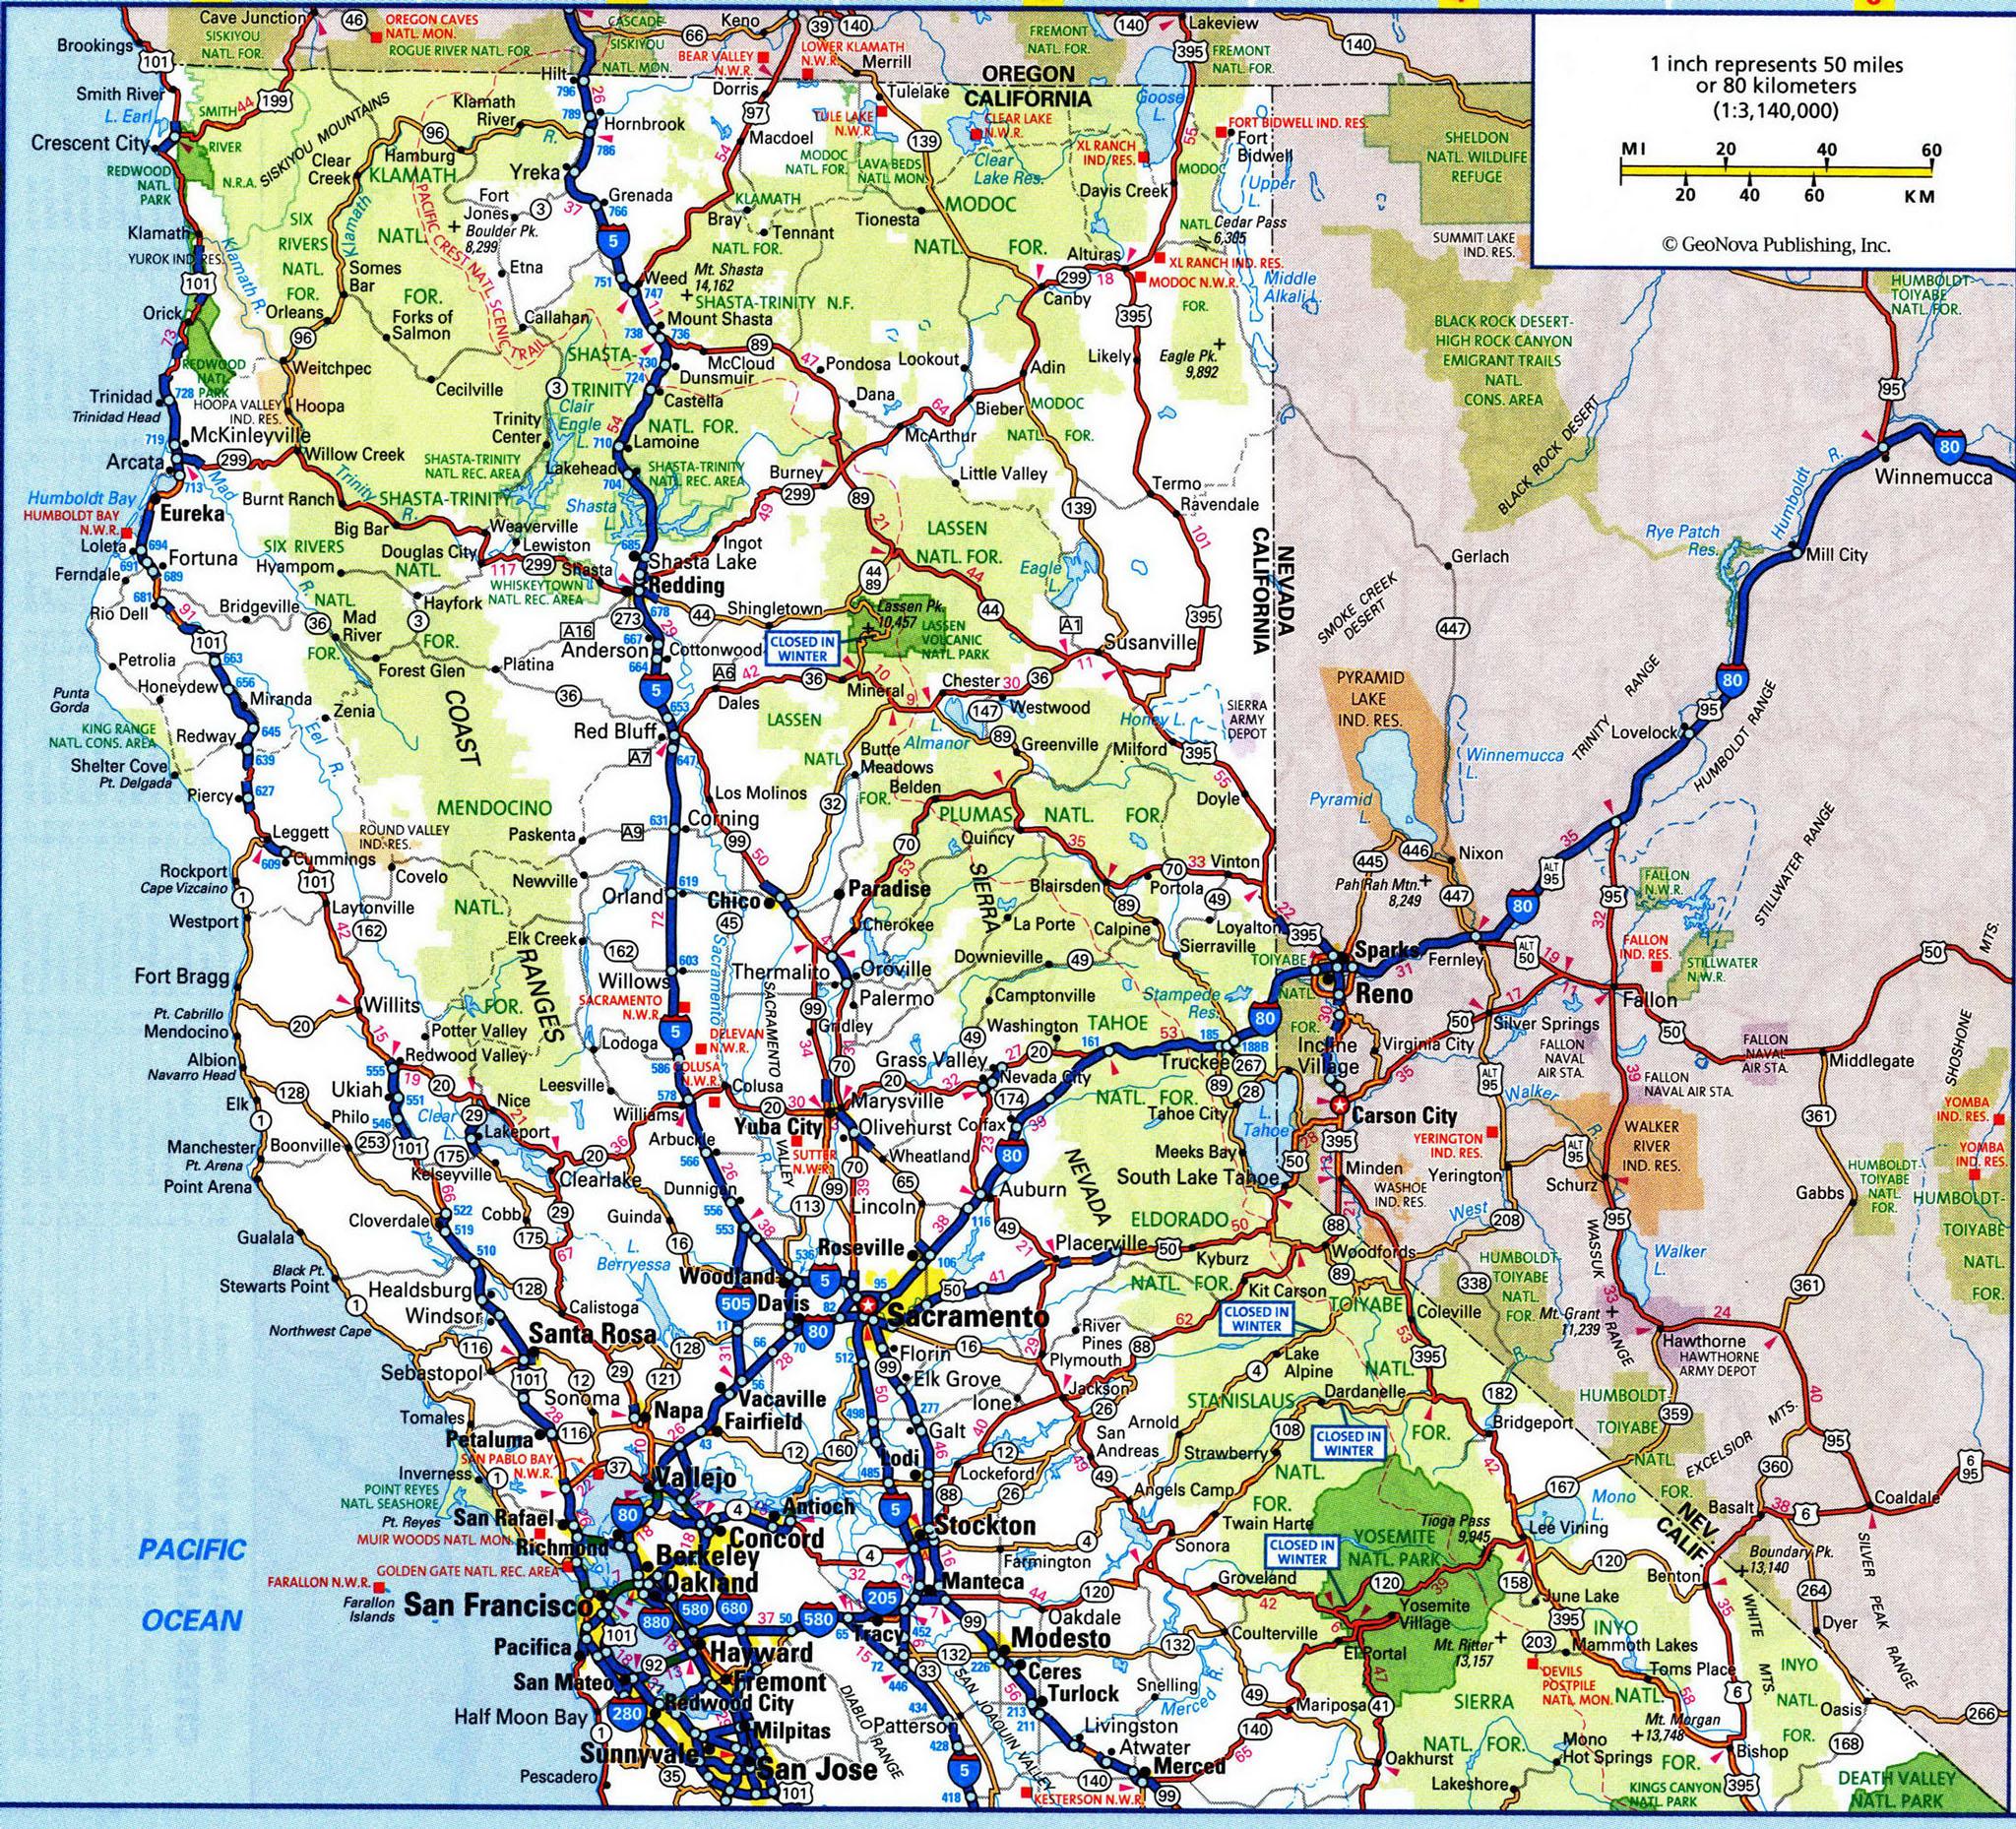 Map Of North California California River Map Northern California - Road Map Of Northern California